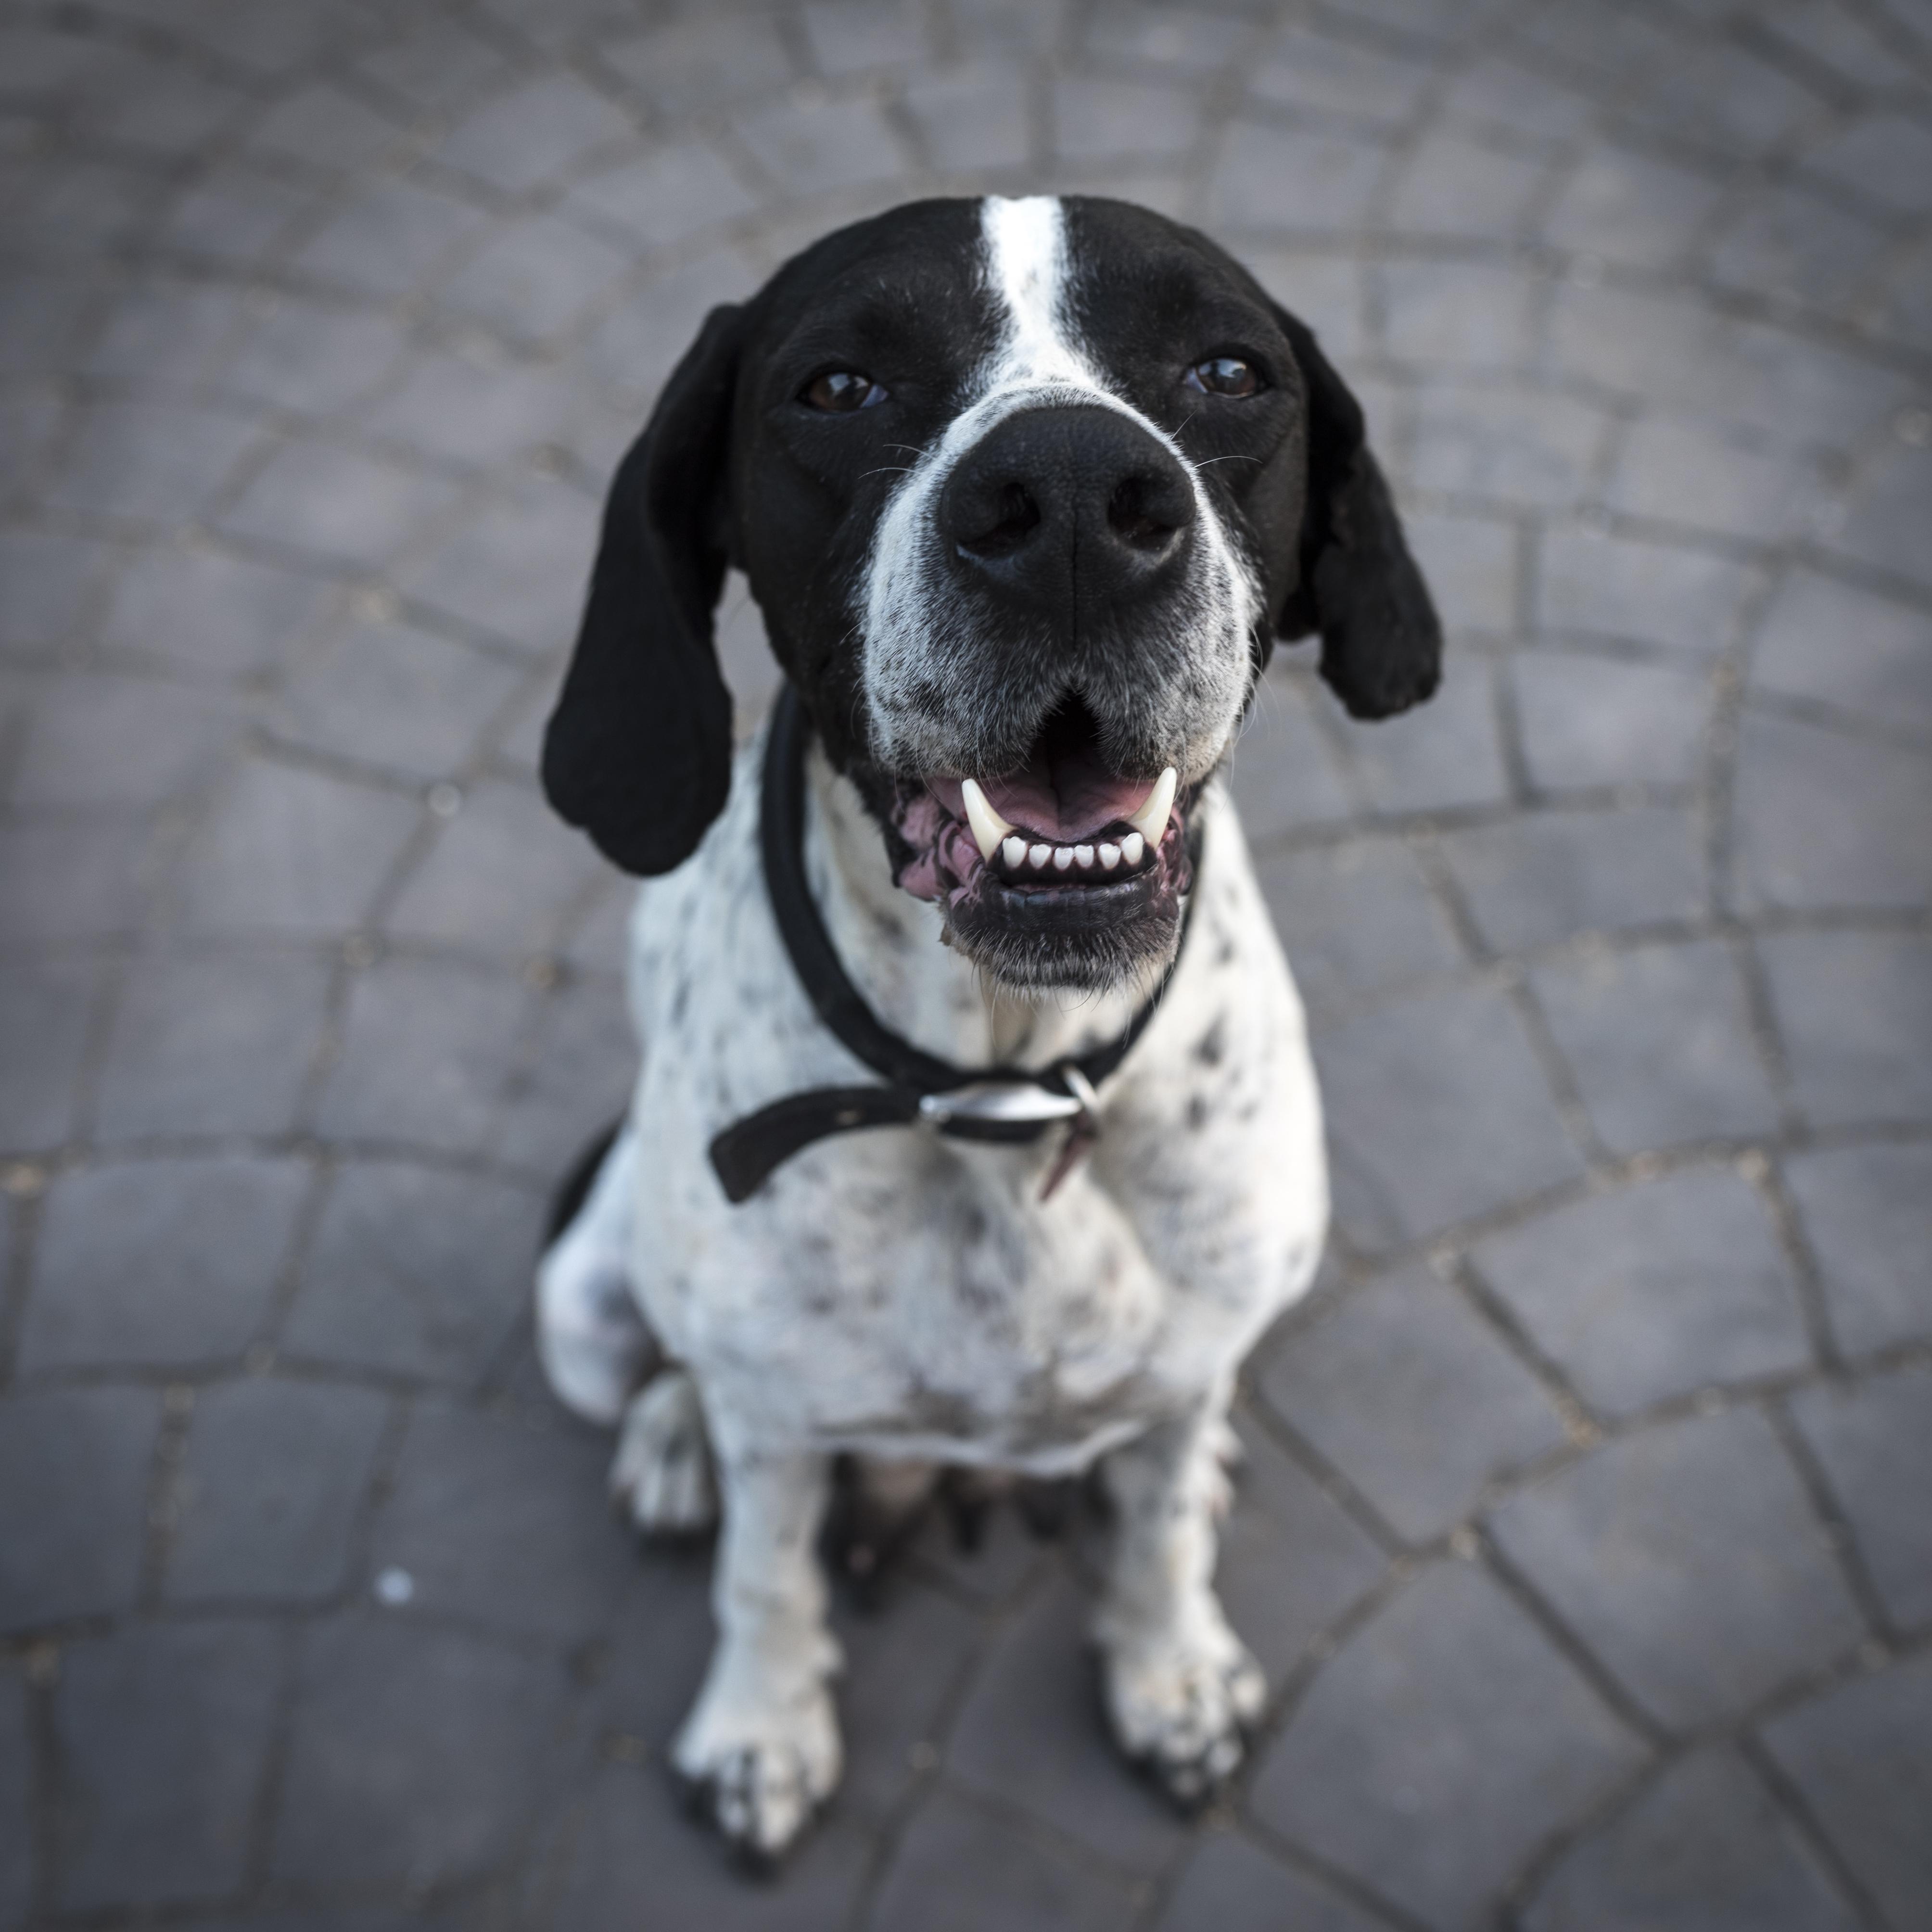 dog dogs training pexels aggressive short collar tips pets bar shock alpha cincinnati personal obedience raise programs pet pointer closeup